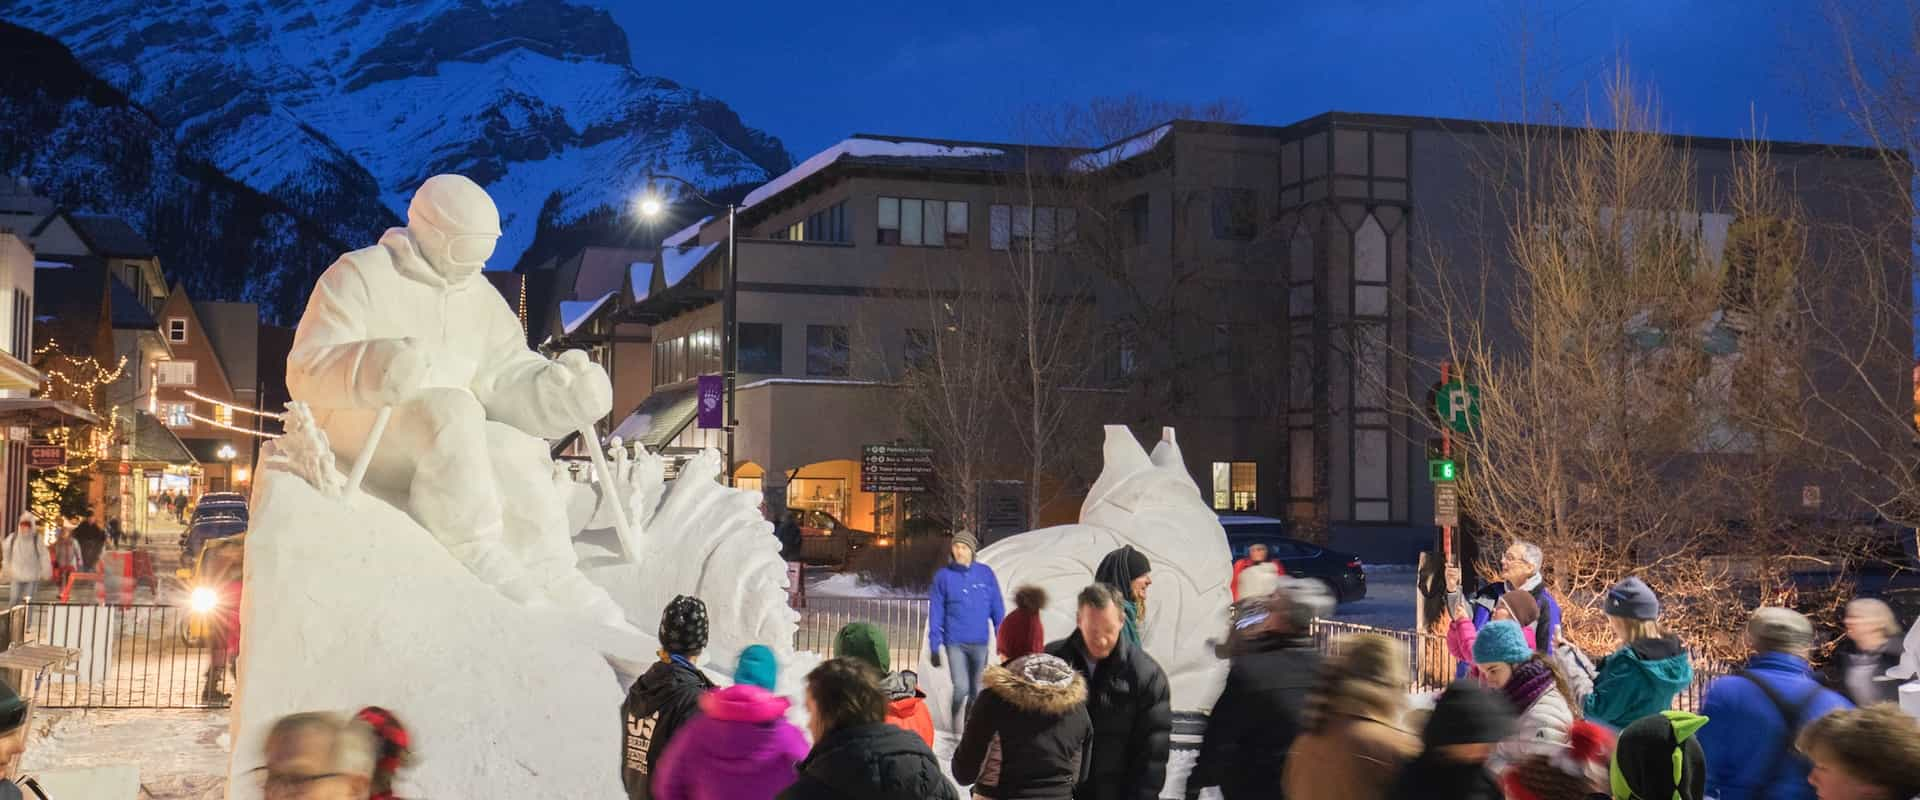 Enjoy snow sculptures during the SnowDays Festival